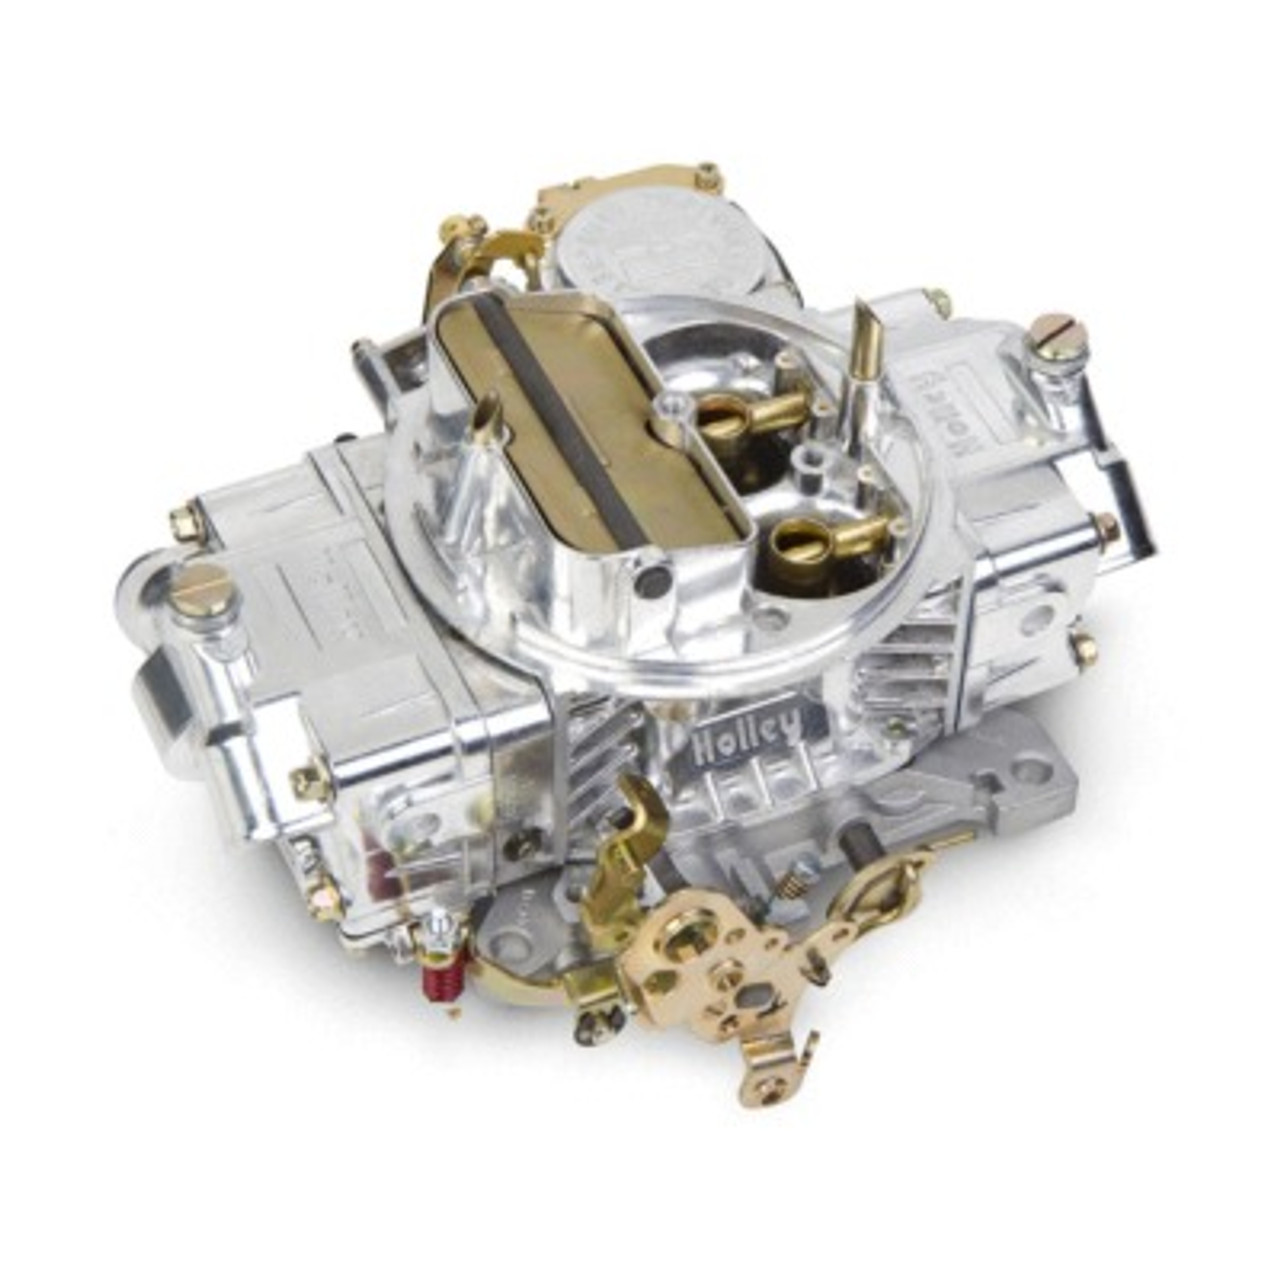 HLY0-3310SA, Carburetor, Model 4160, 4-Barrel, 750 CFM, Square Bore, Manual Choke, Vacuum Secondary, Dual Inlet, Polished, Each